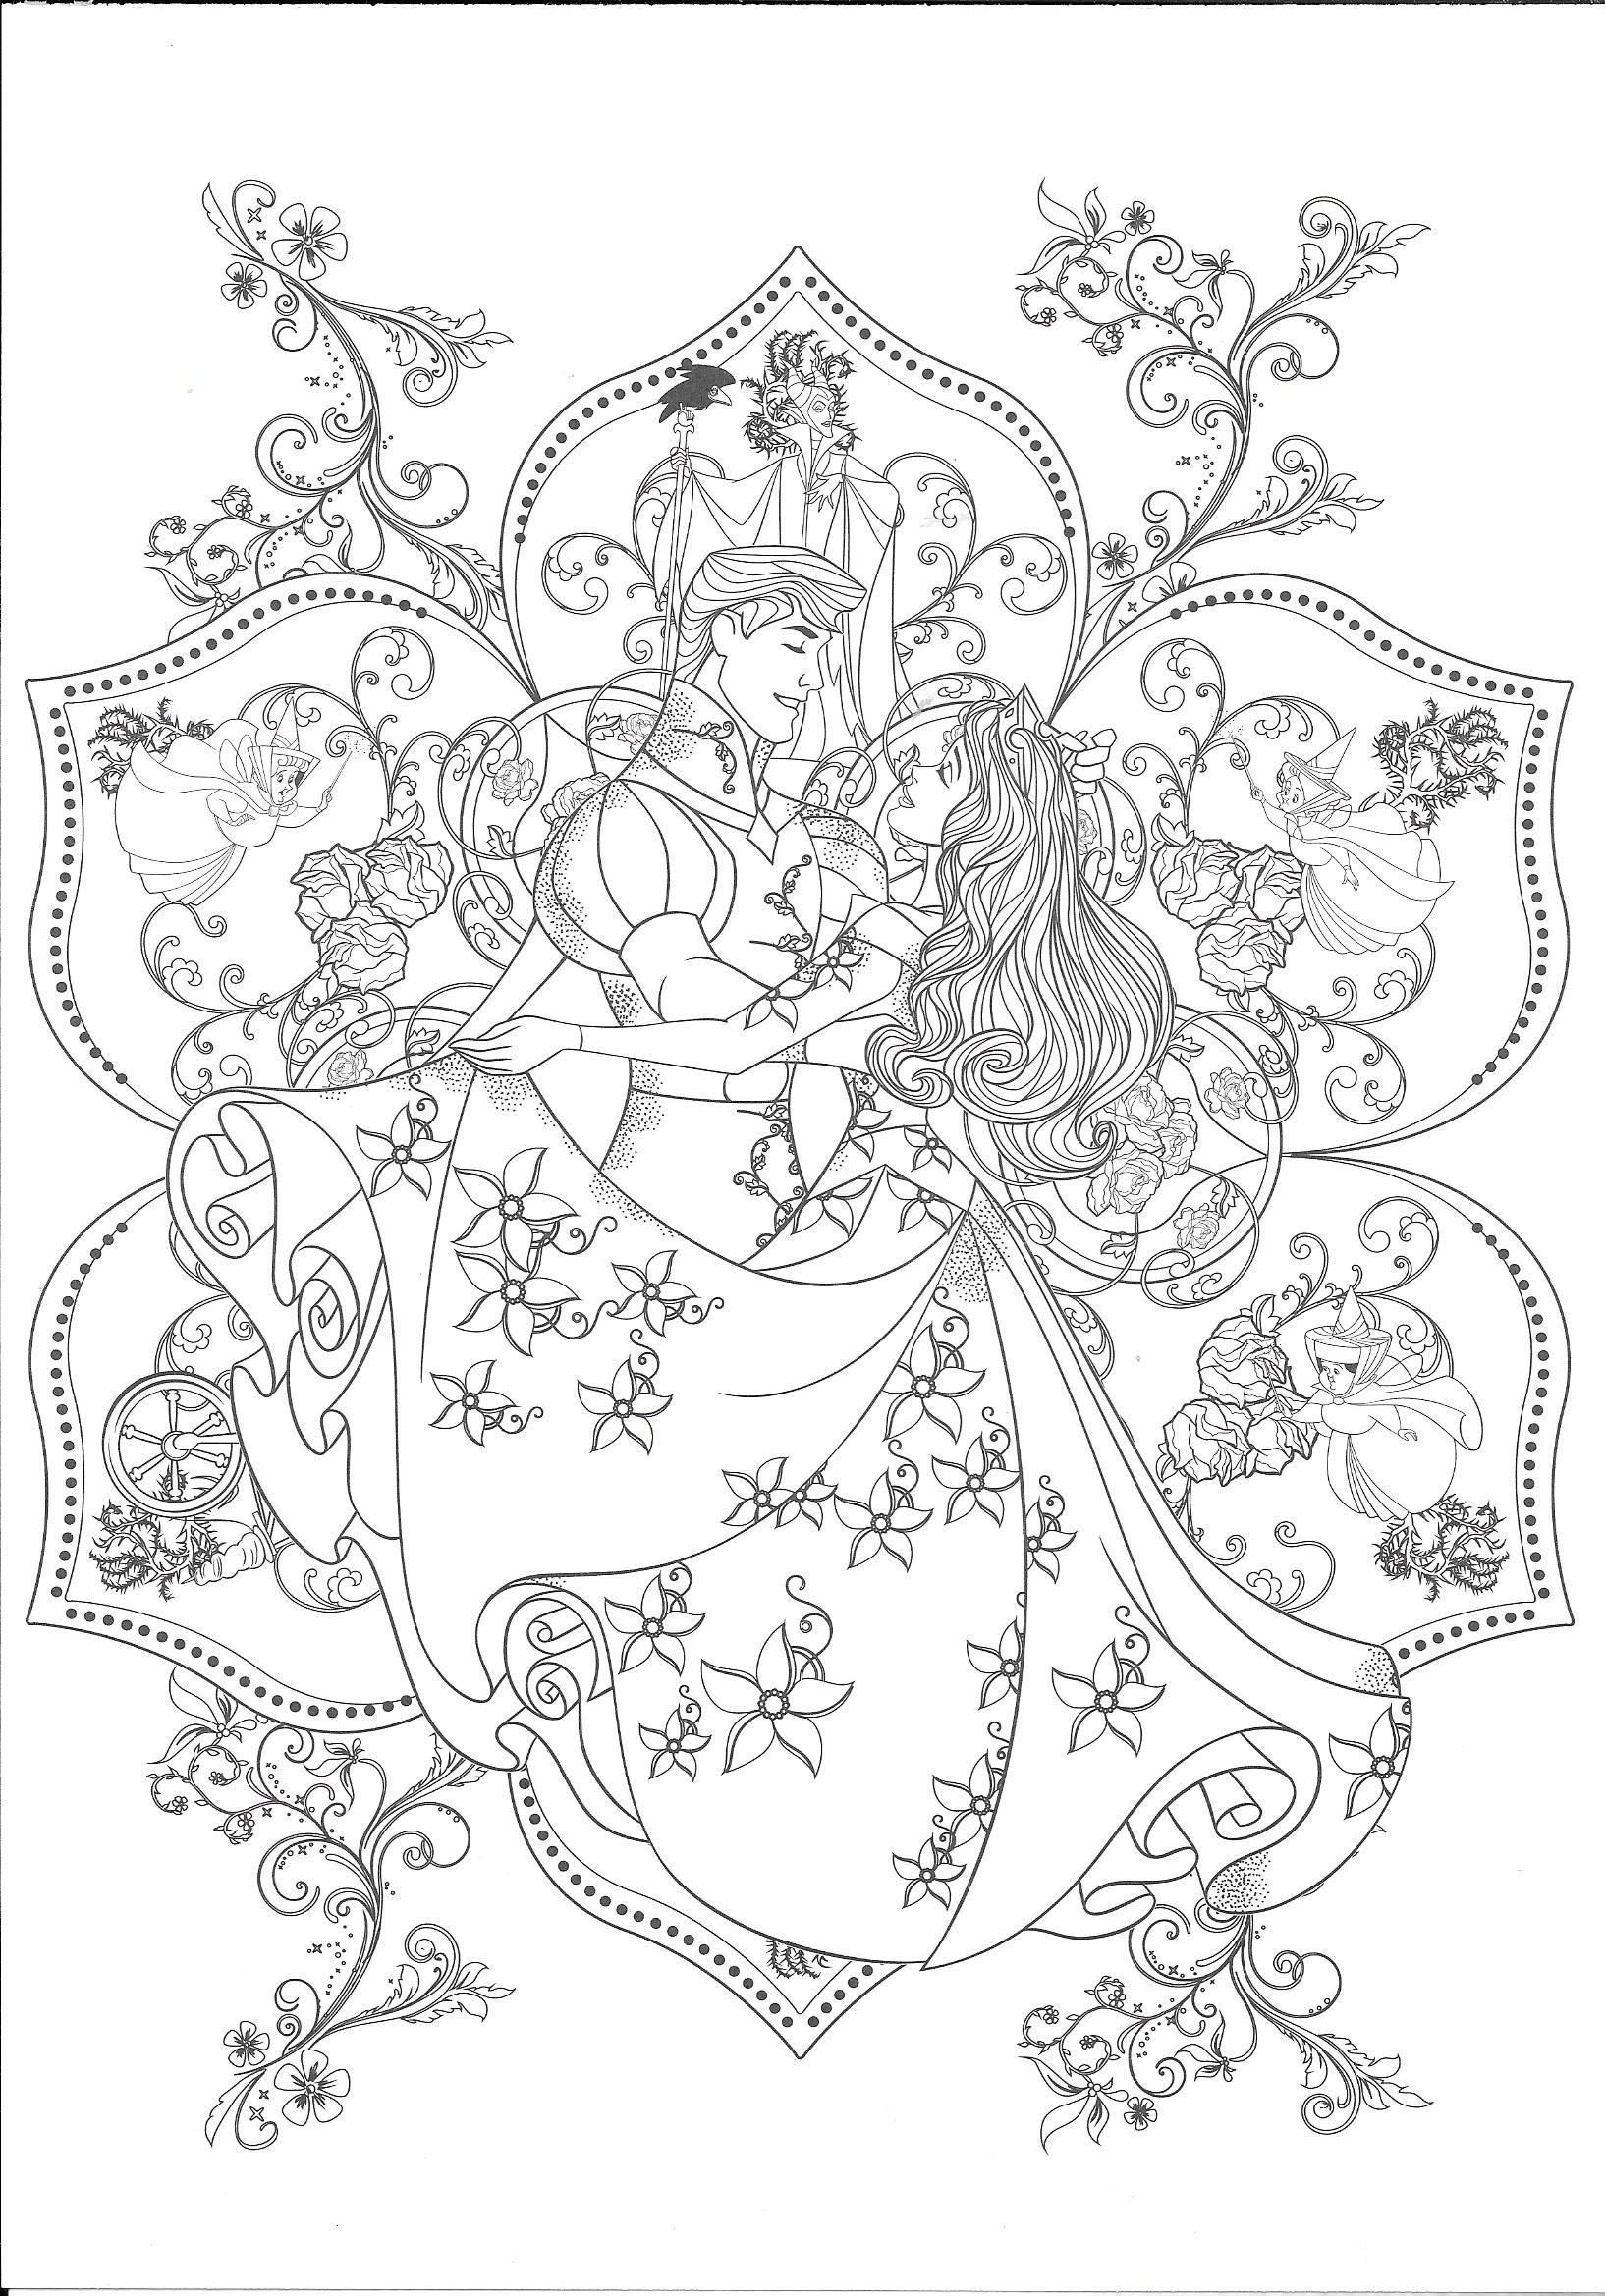 Pin By Jamie Wharton On Desenhos Princesas Disney Disney Coloring Pages Printables Sleeping Beauty Coloring Pages Disney Princess Coloring Pages